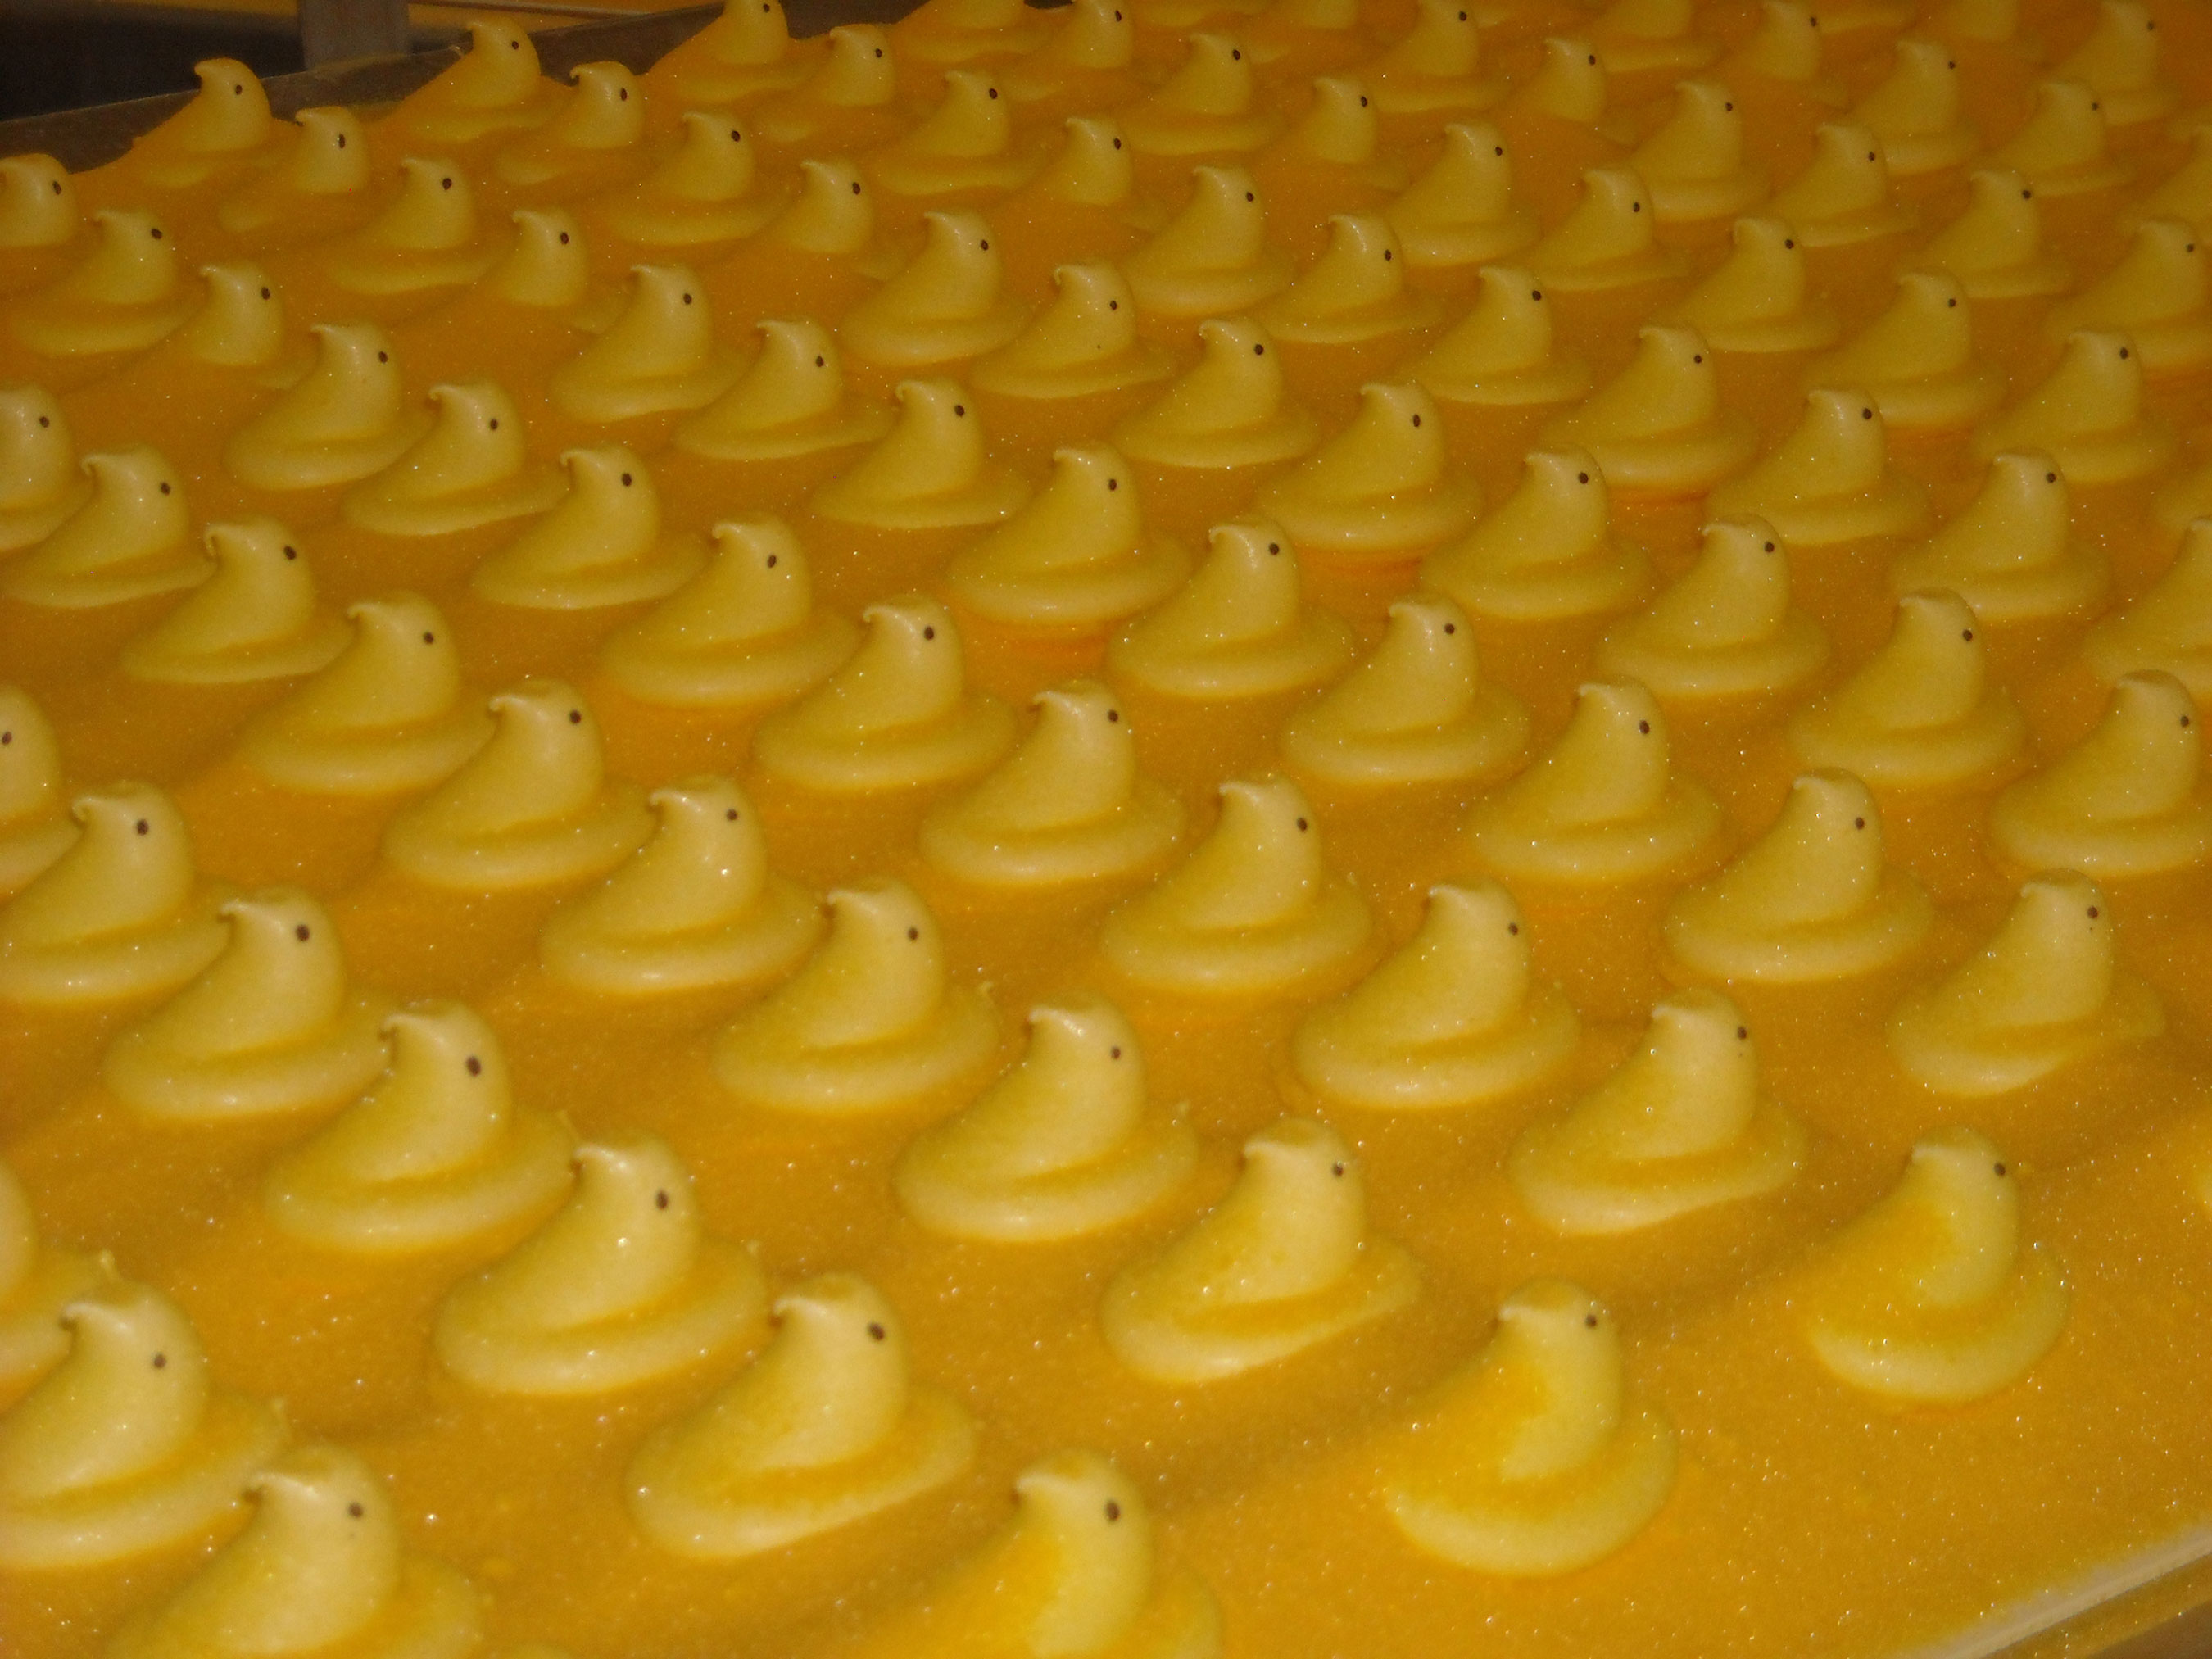 Yellow PEEPS® Chicks on conveyor belt at PEEPS® Factory in Bethlehem, PA